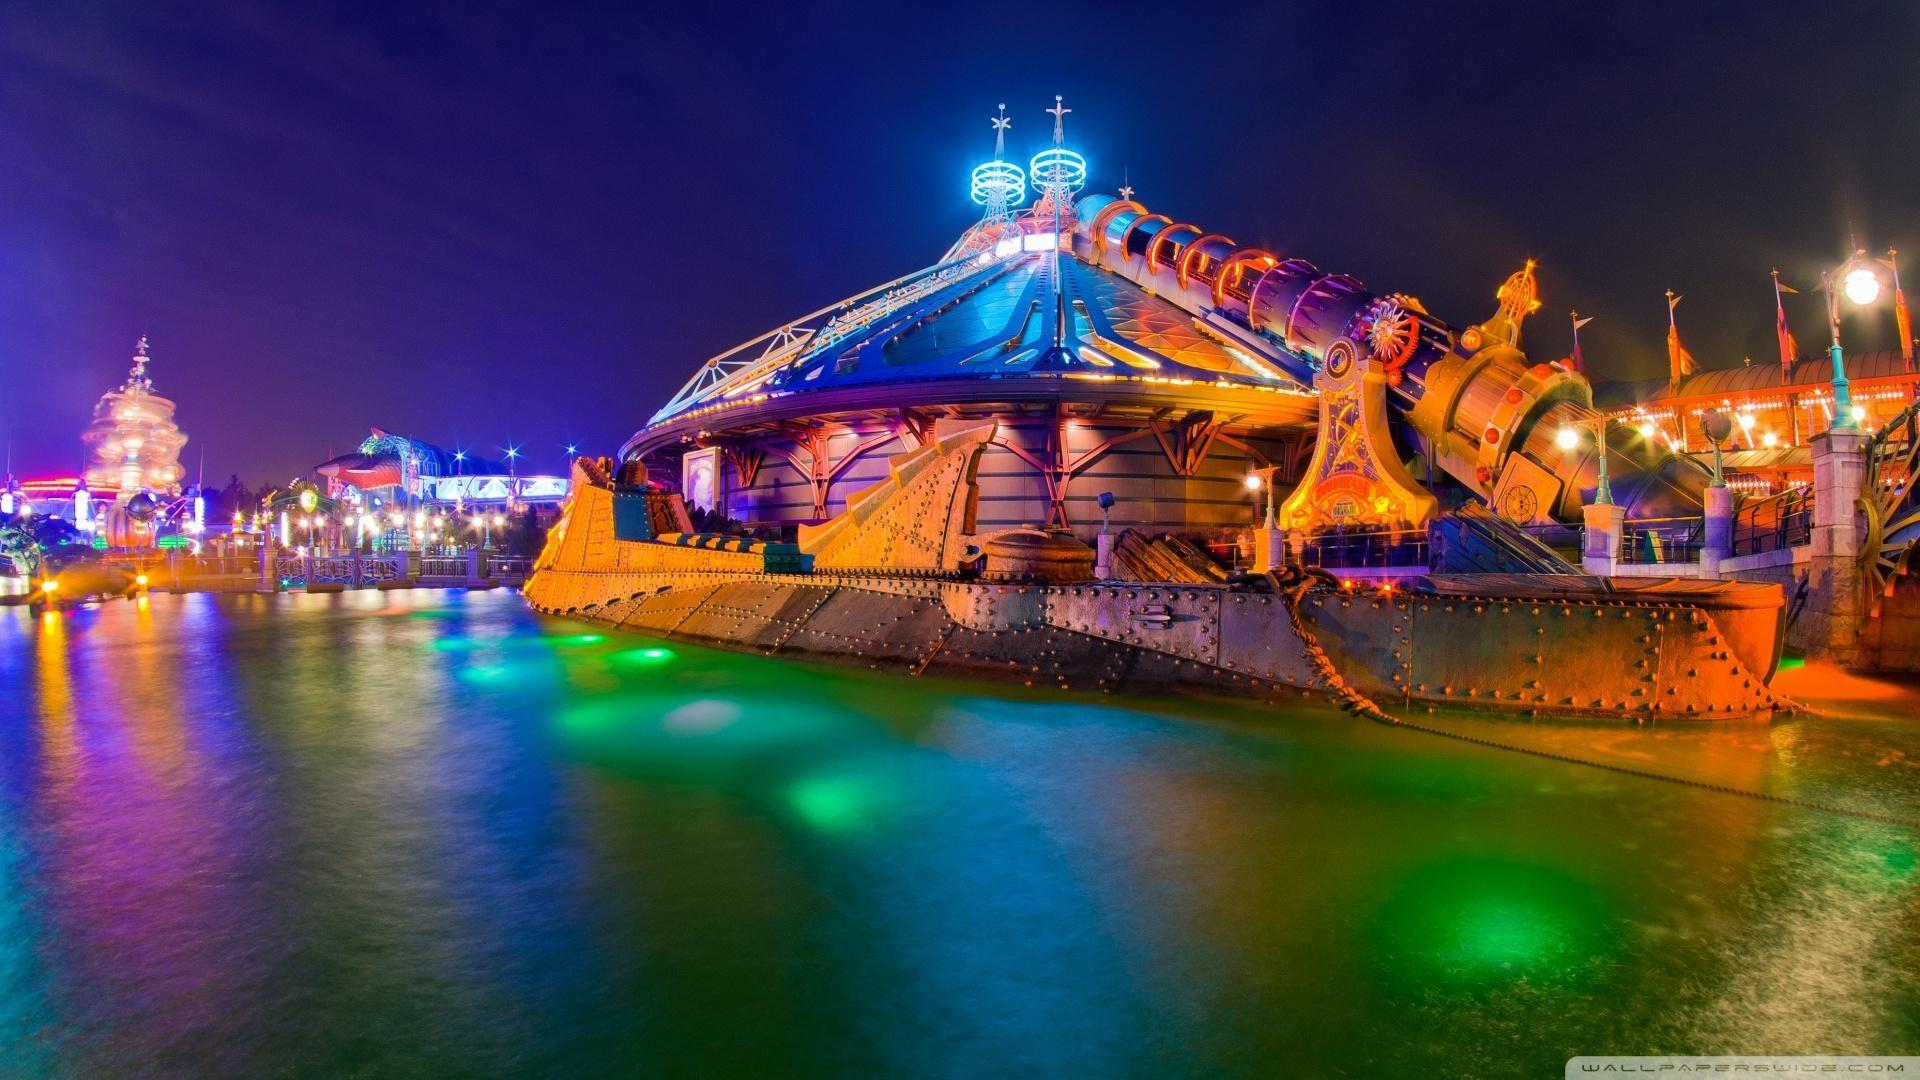 Space-Mountain-Disneyland-Paris-1920×1080-Need-iPhone-S-